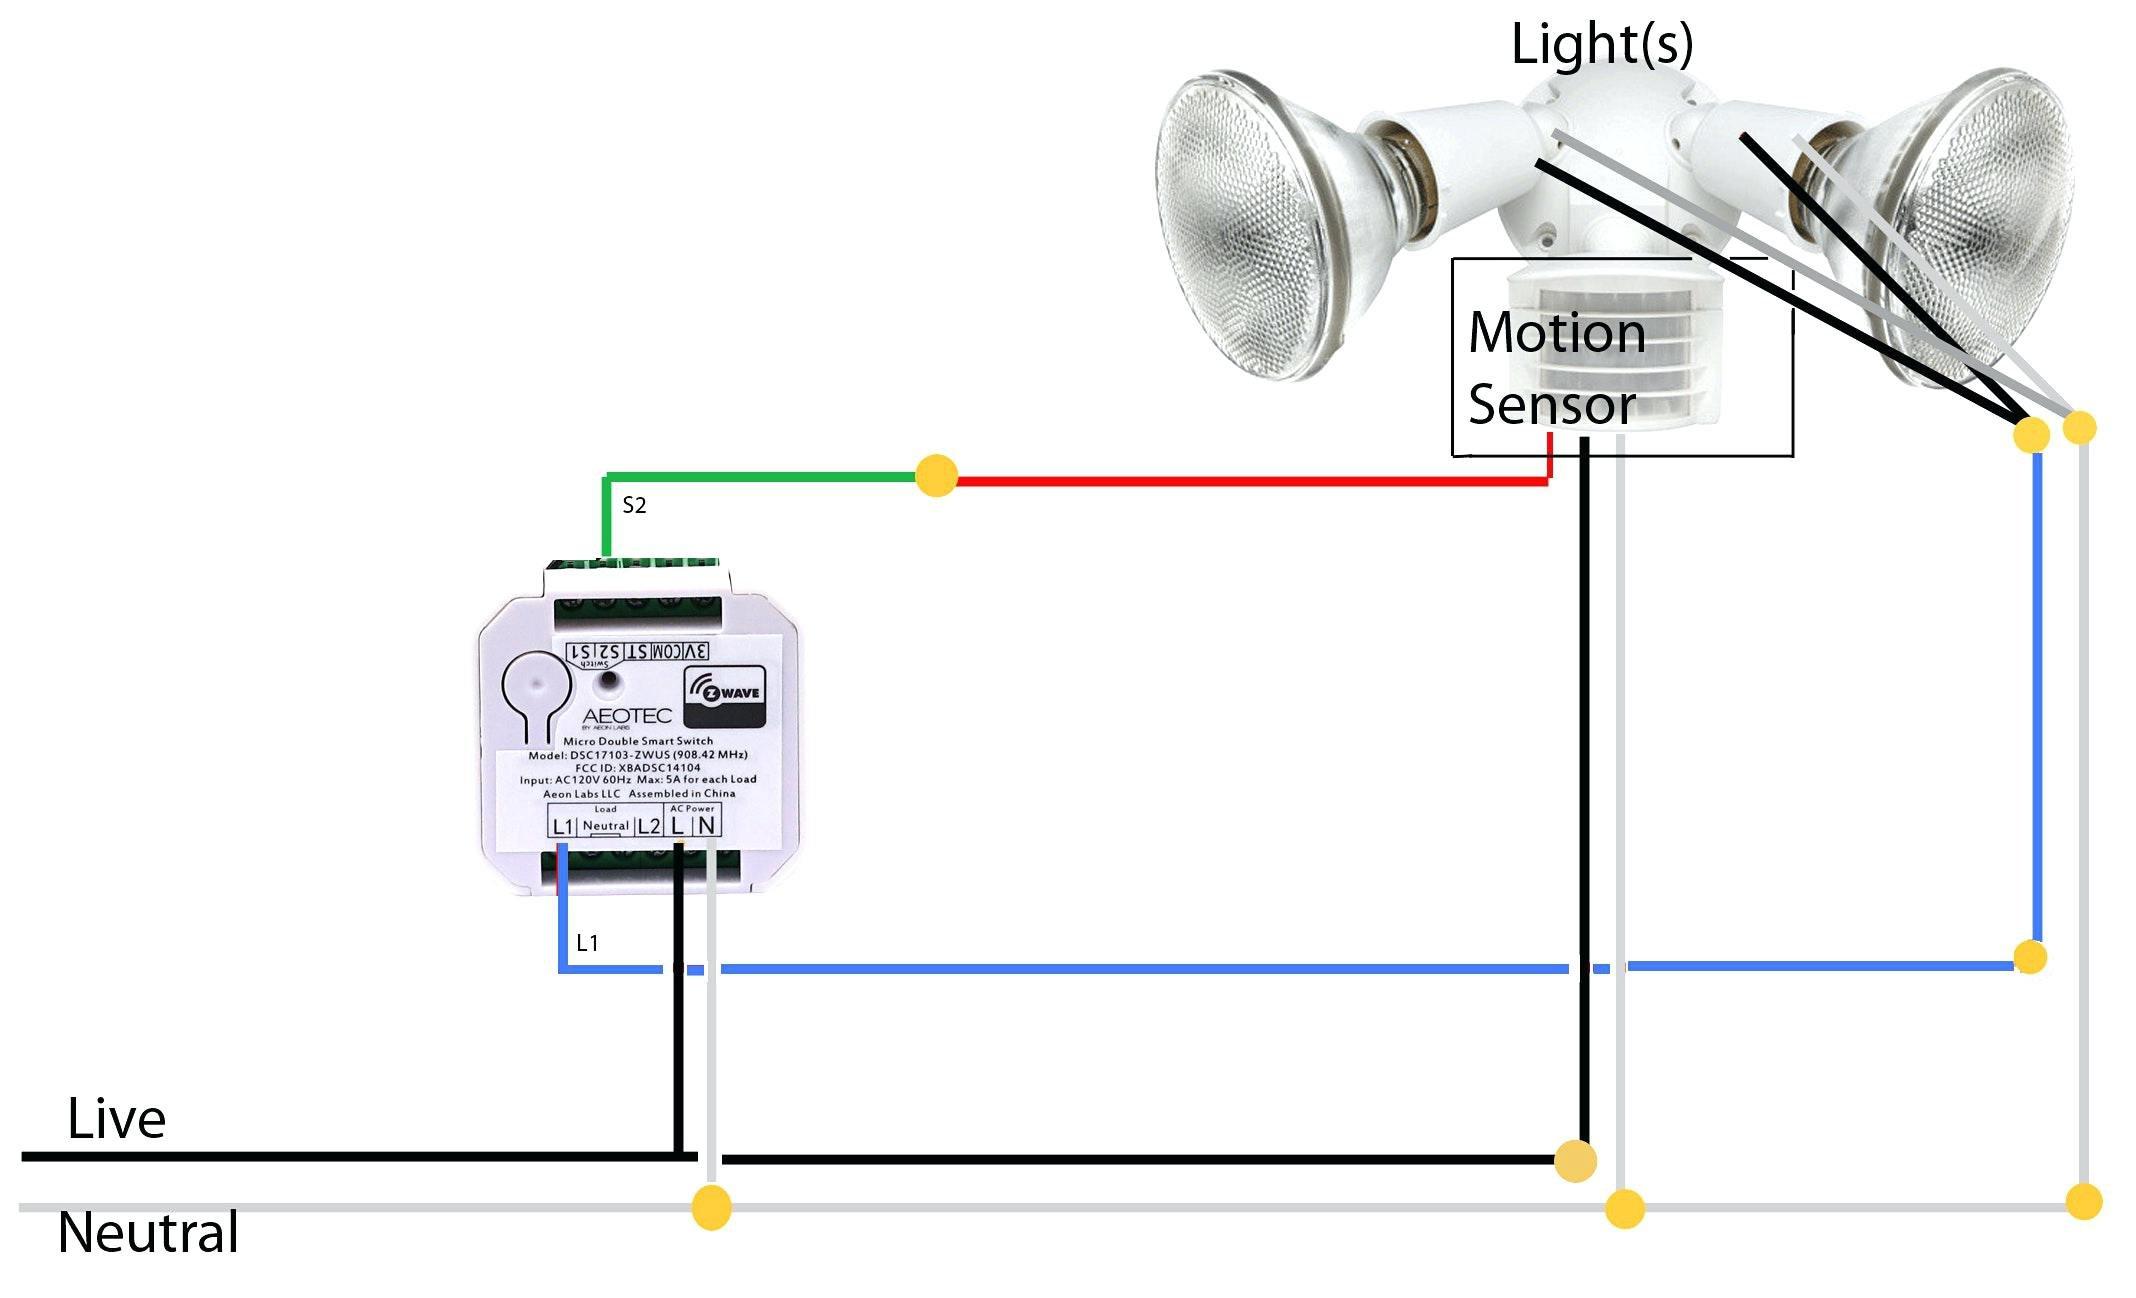 Zenith Motion Sensor Light Wiring Diagram | Wiring Diagram - Heath Zenith Motion Sensor Light Wiring Diagram